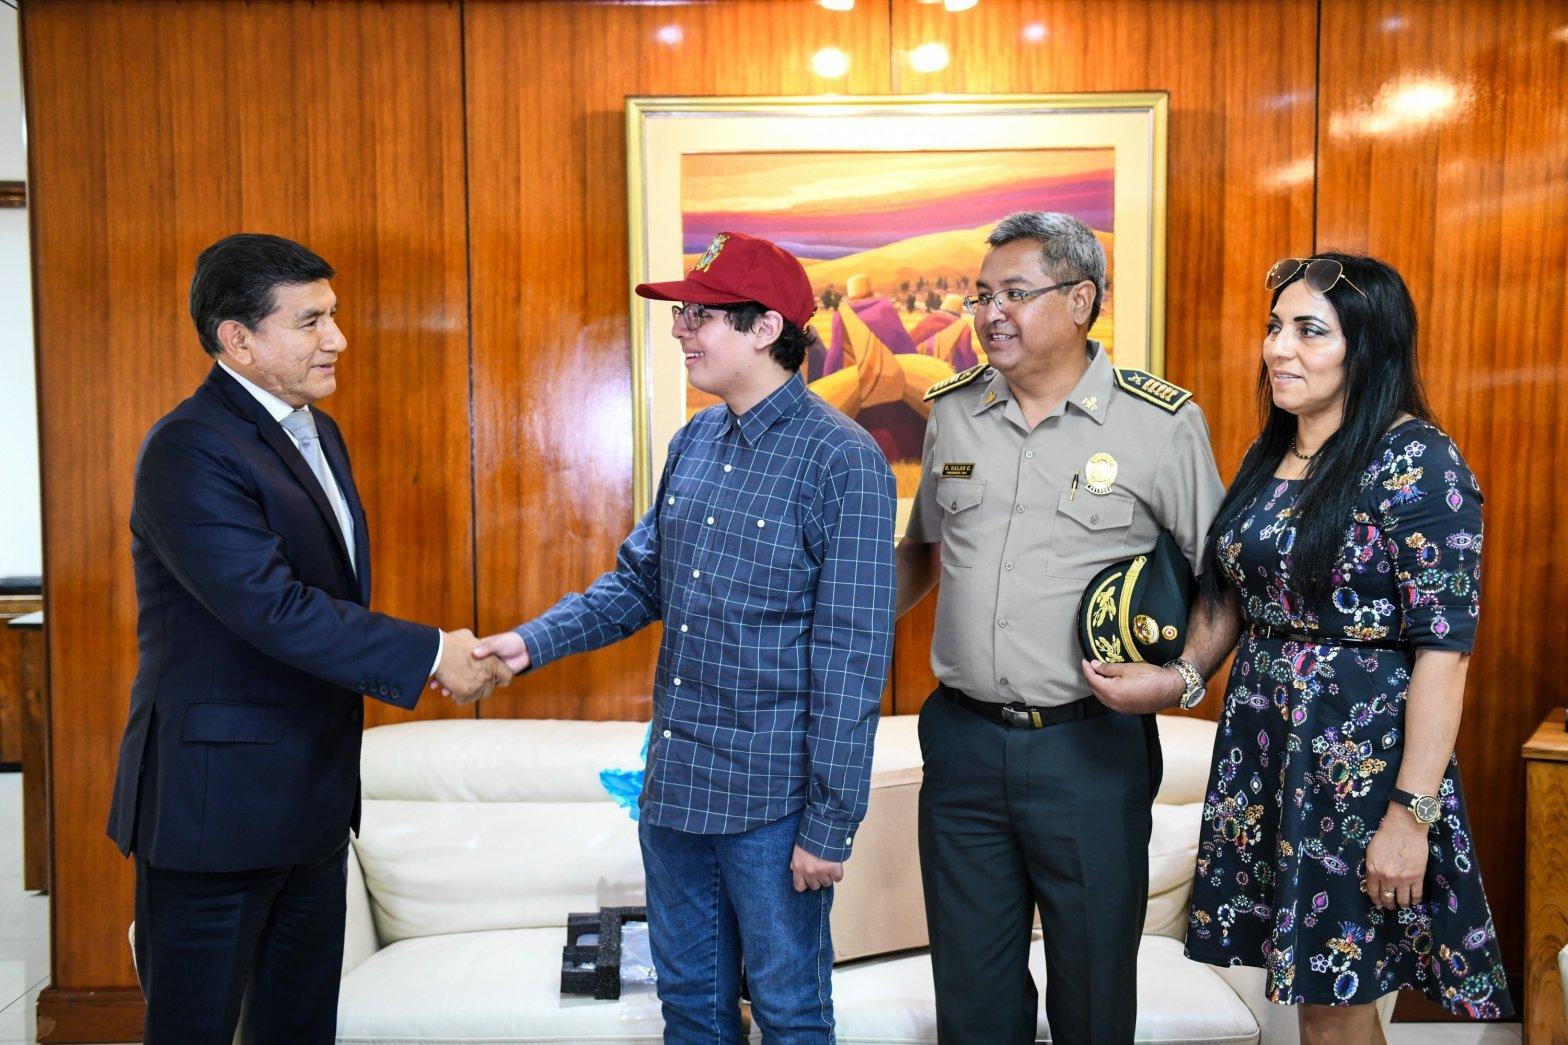 Mininter felicitó a primer puesto de San Marcos por ser orgullo de familia policial